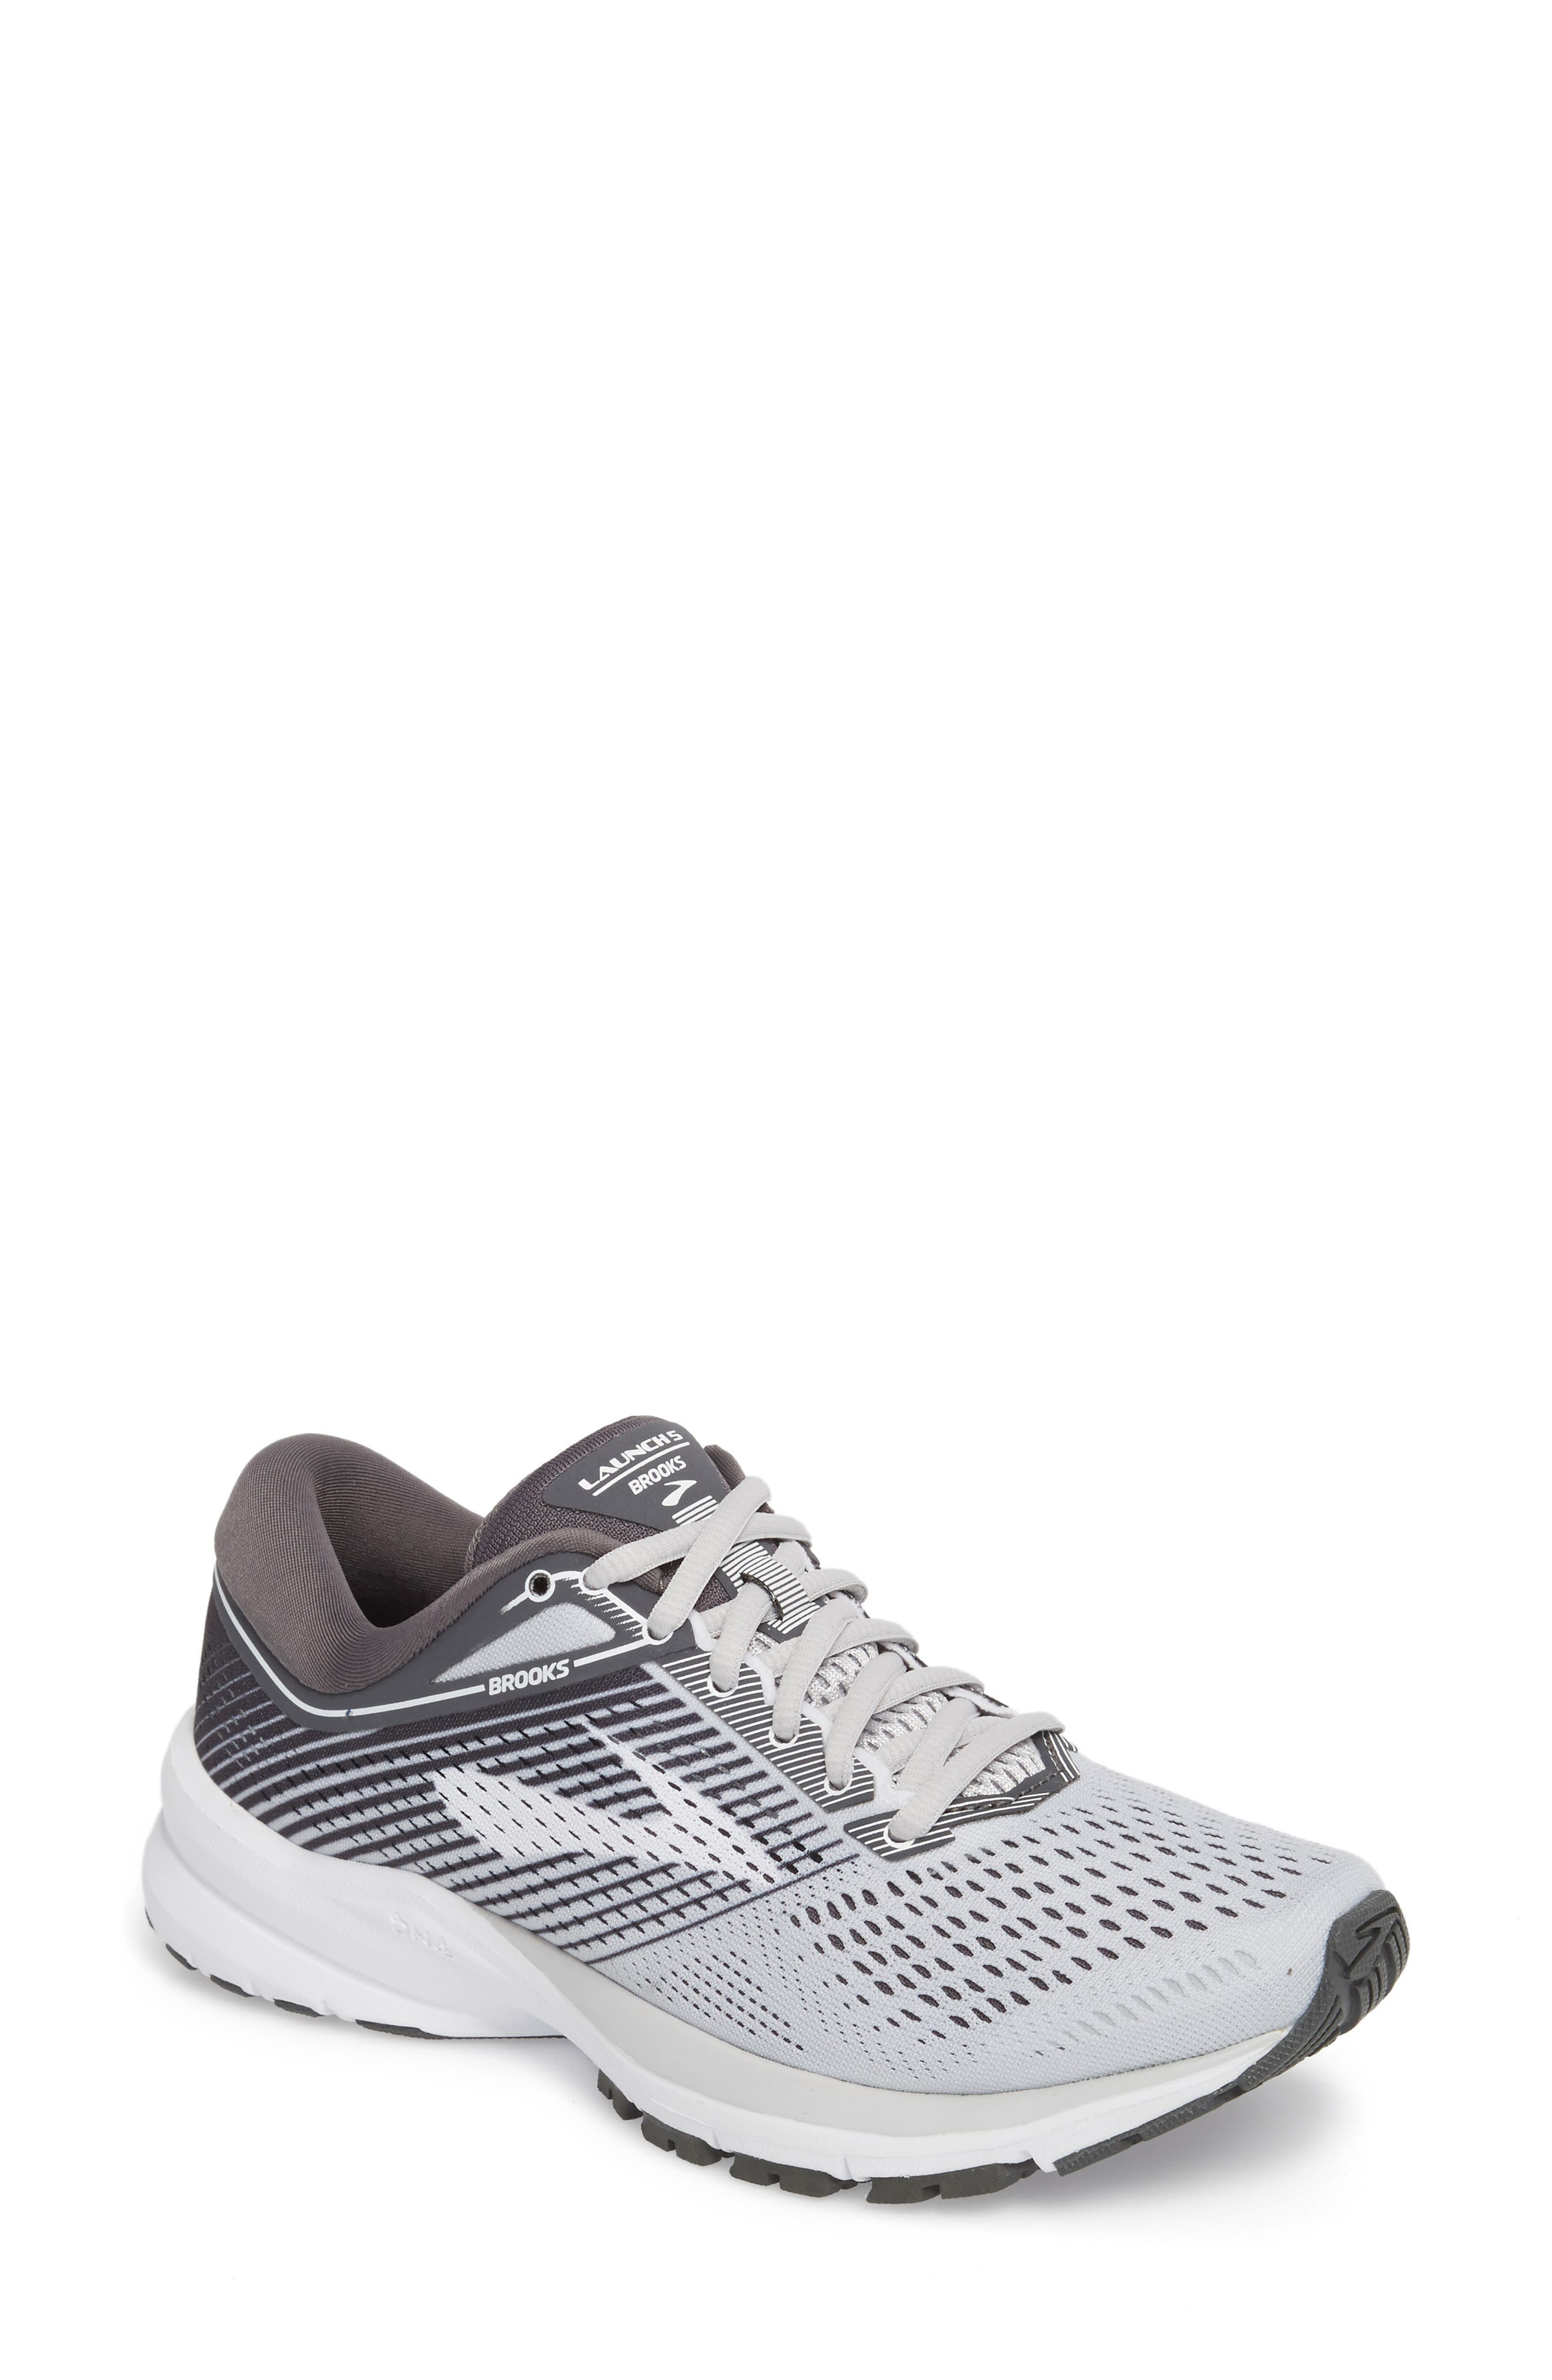 Brooks Launch 5 Running Shoe (Women)